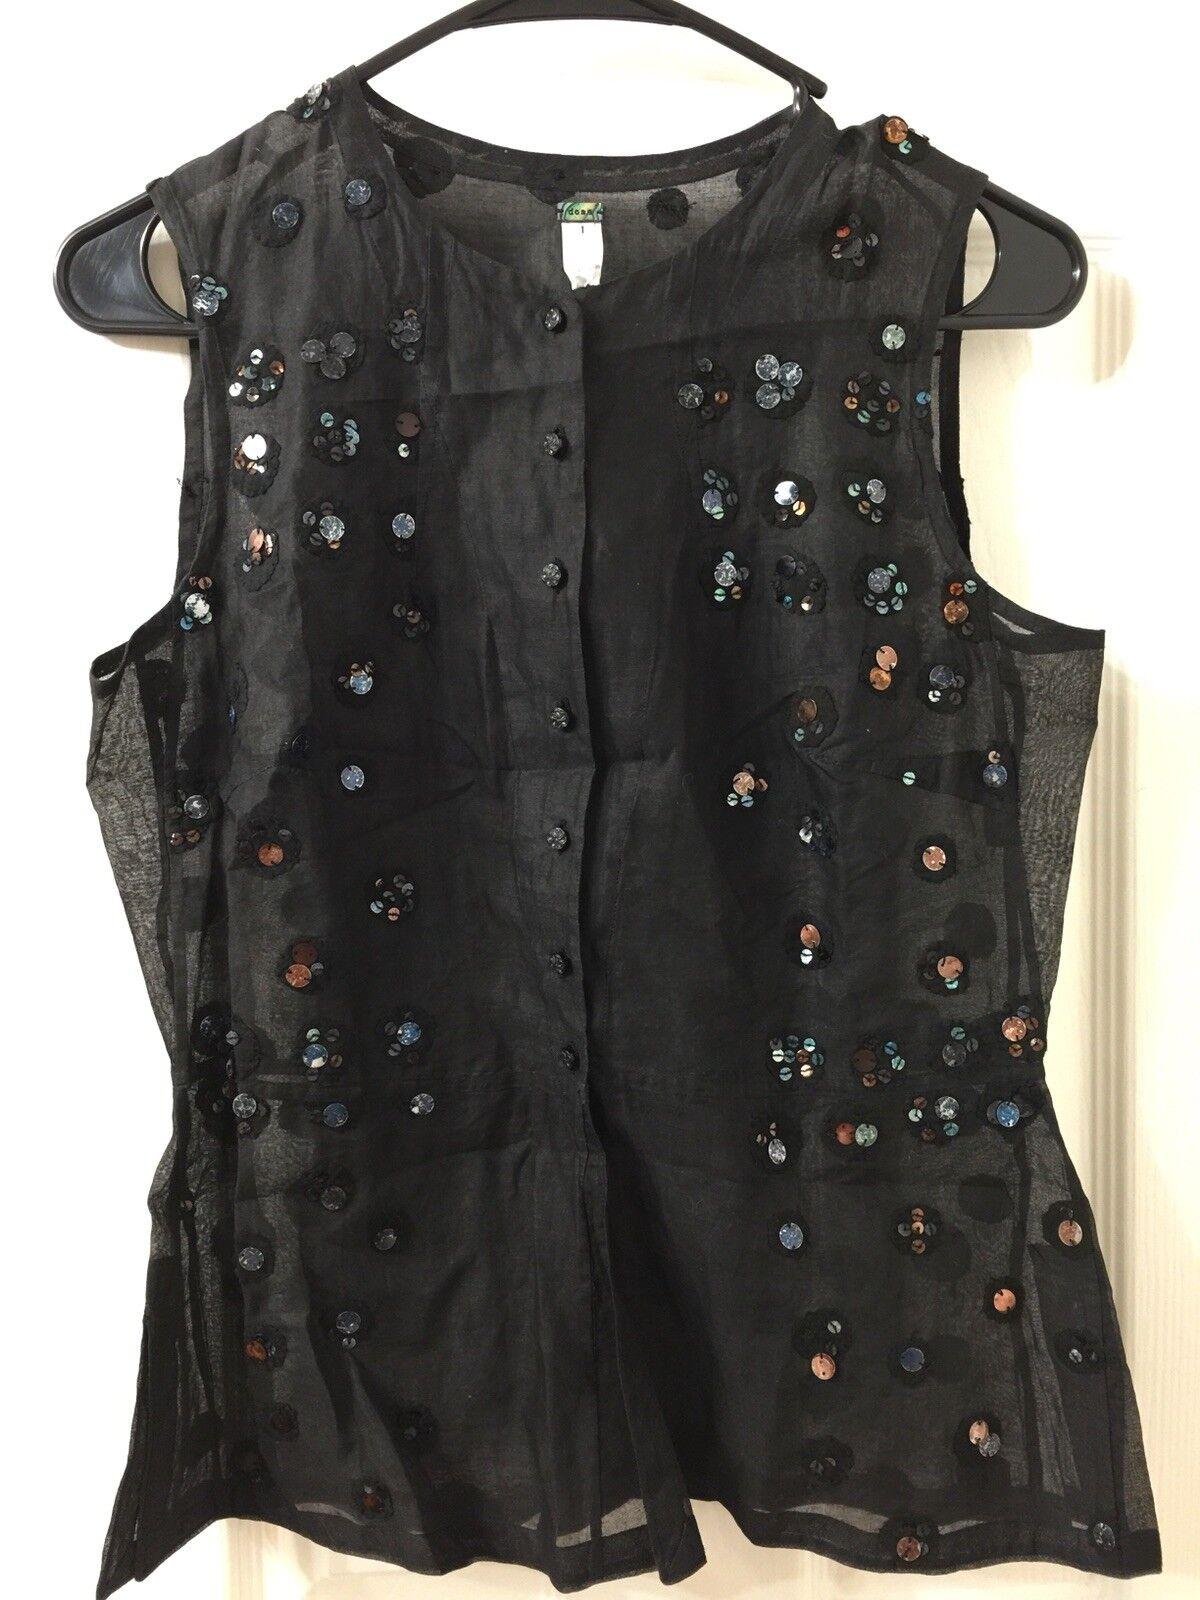 Dosa Cotton Bead Design Blouse Top Sz 1